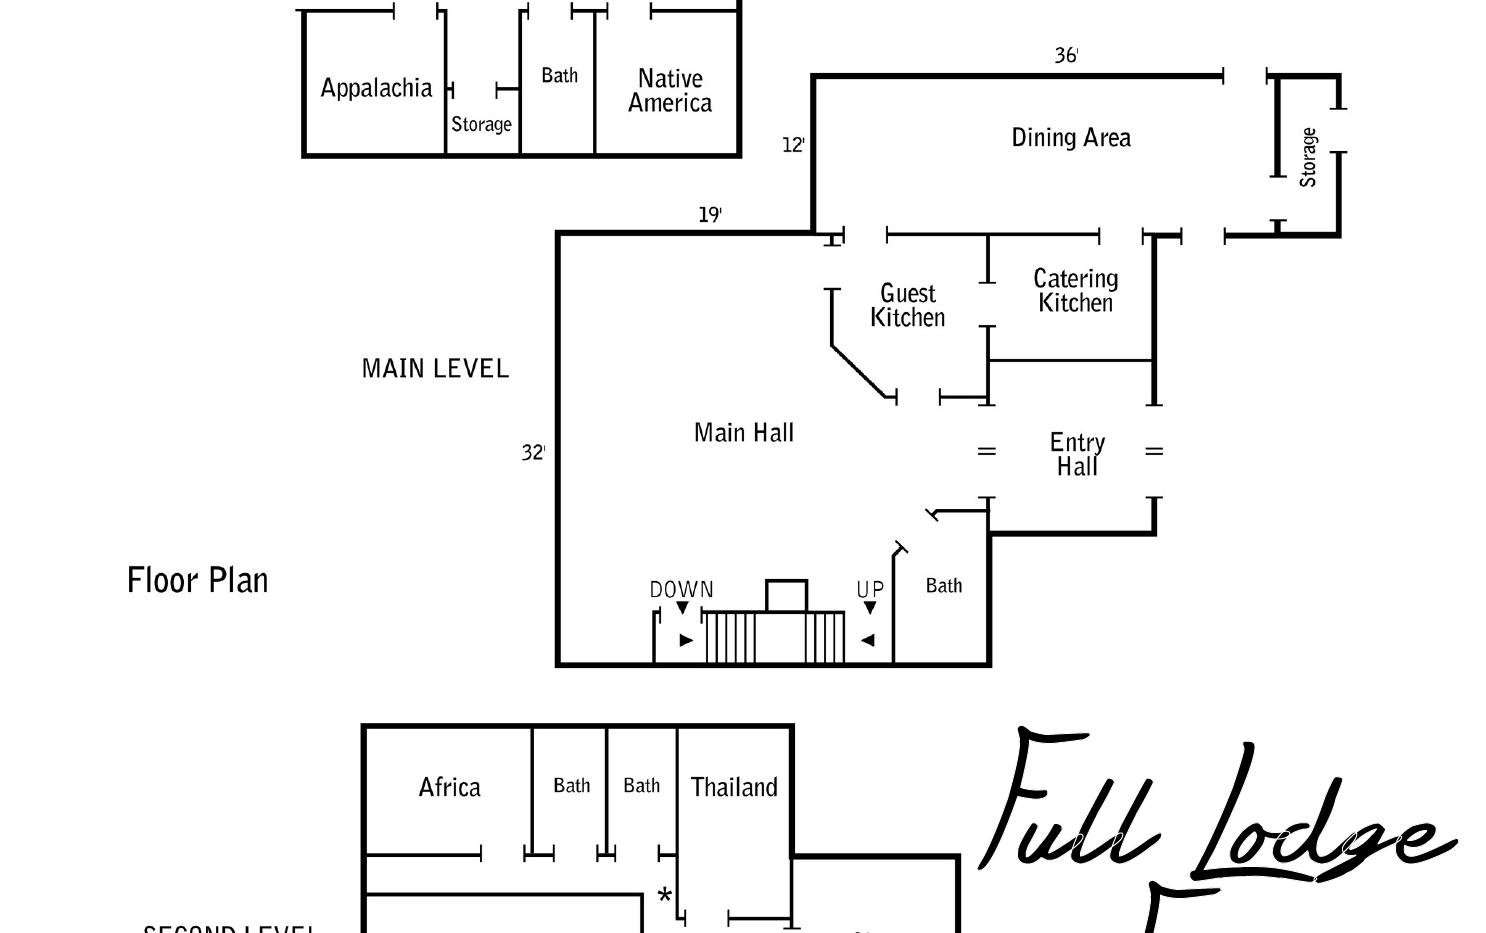 Full Lodge Floor Plan.png